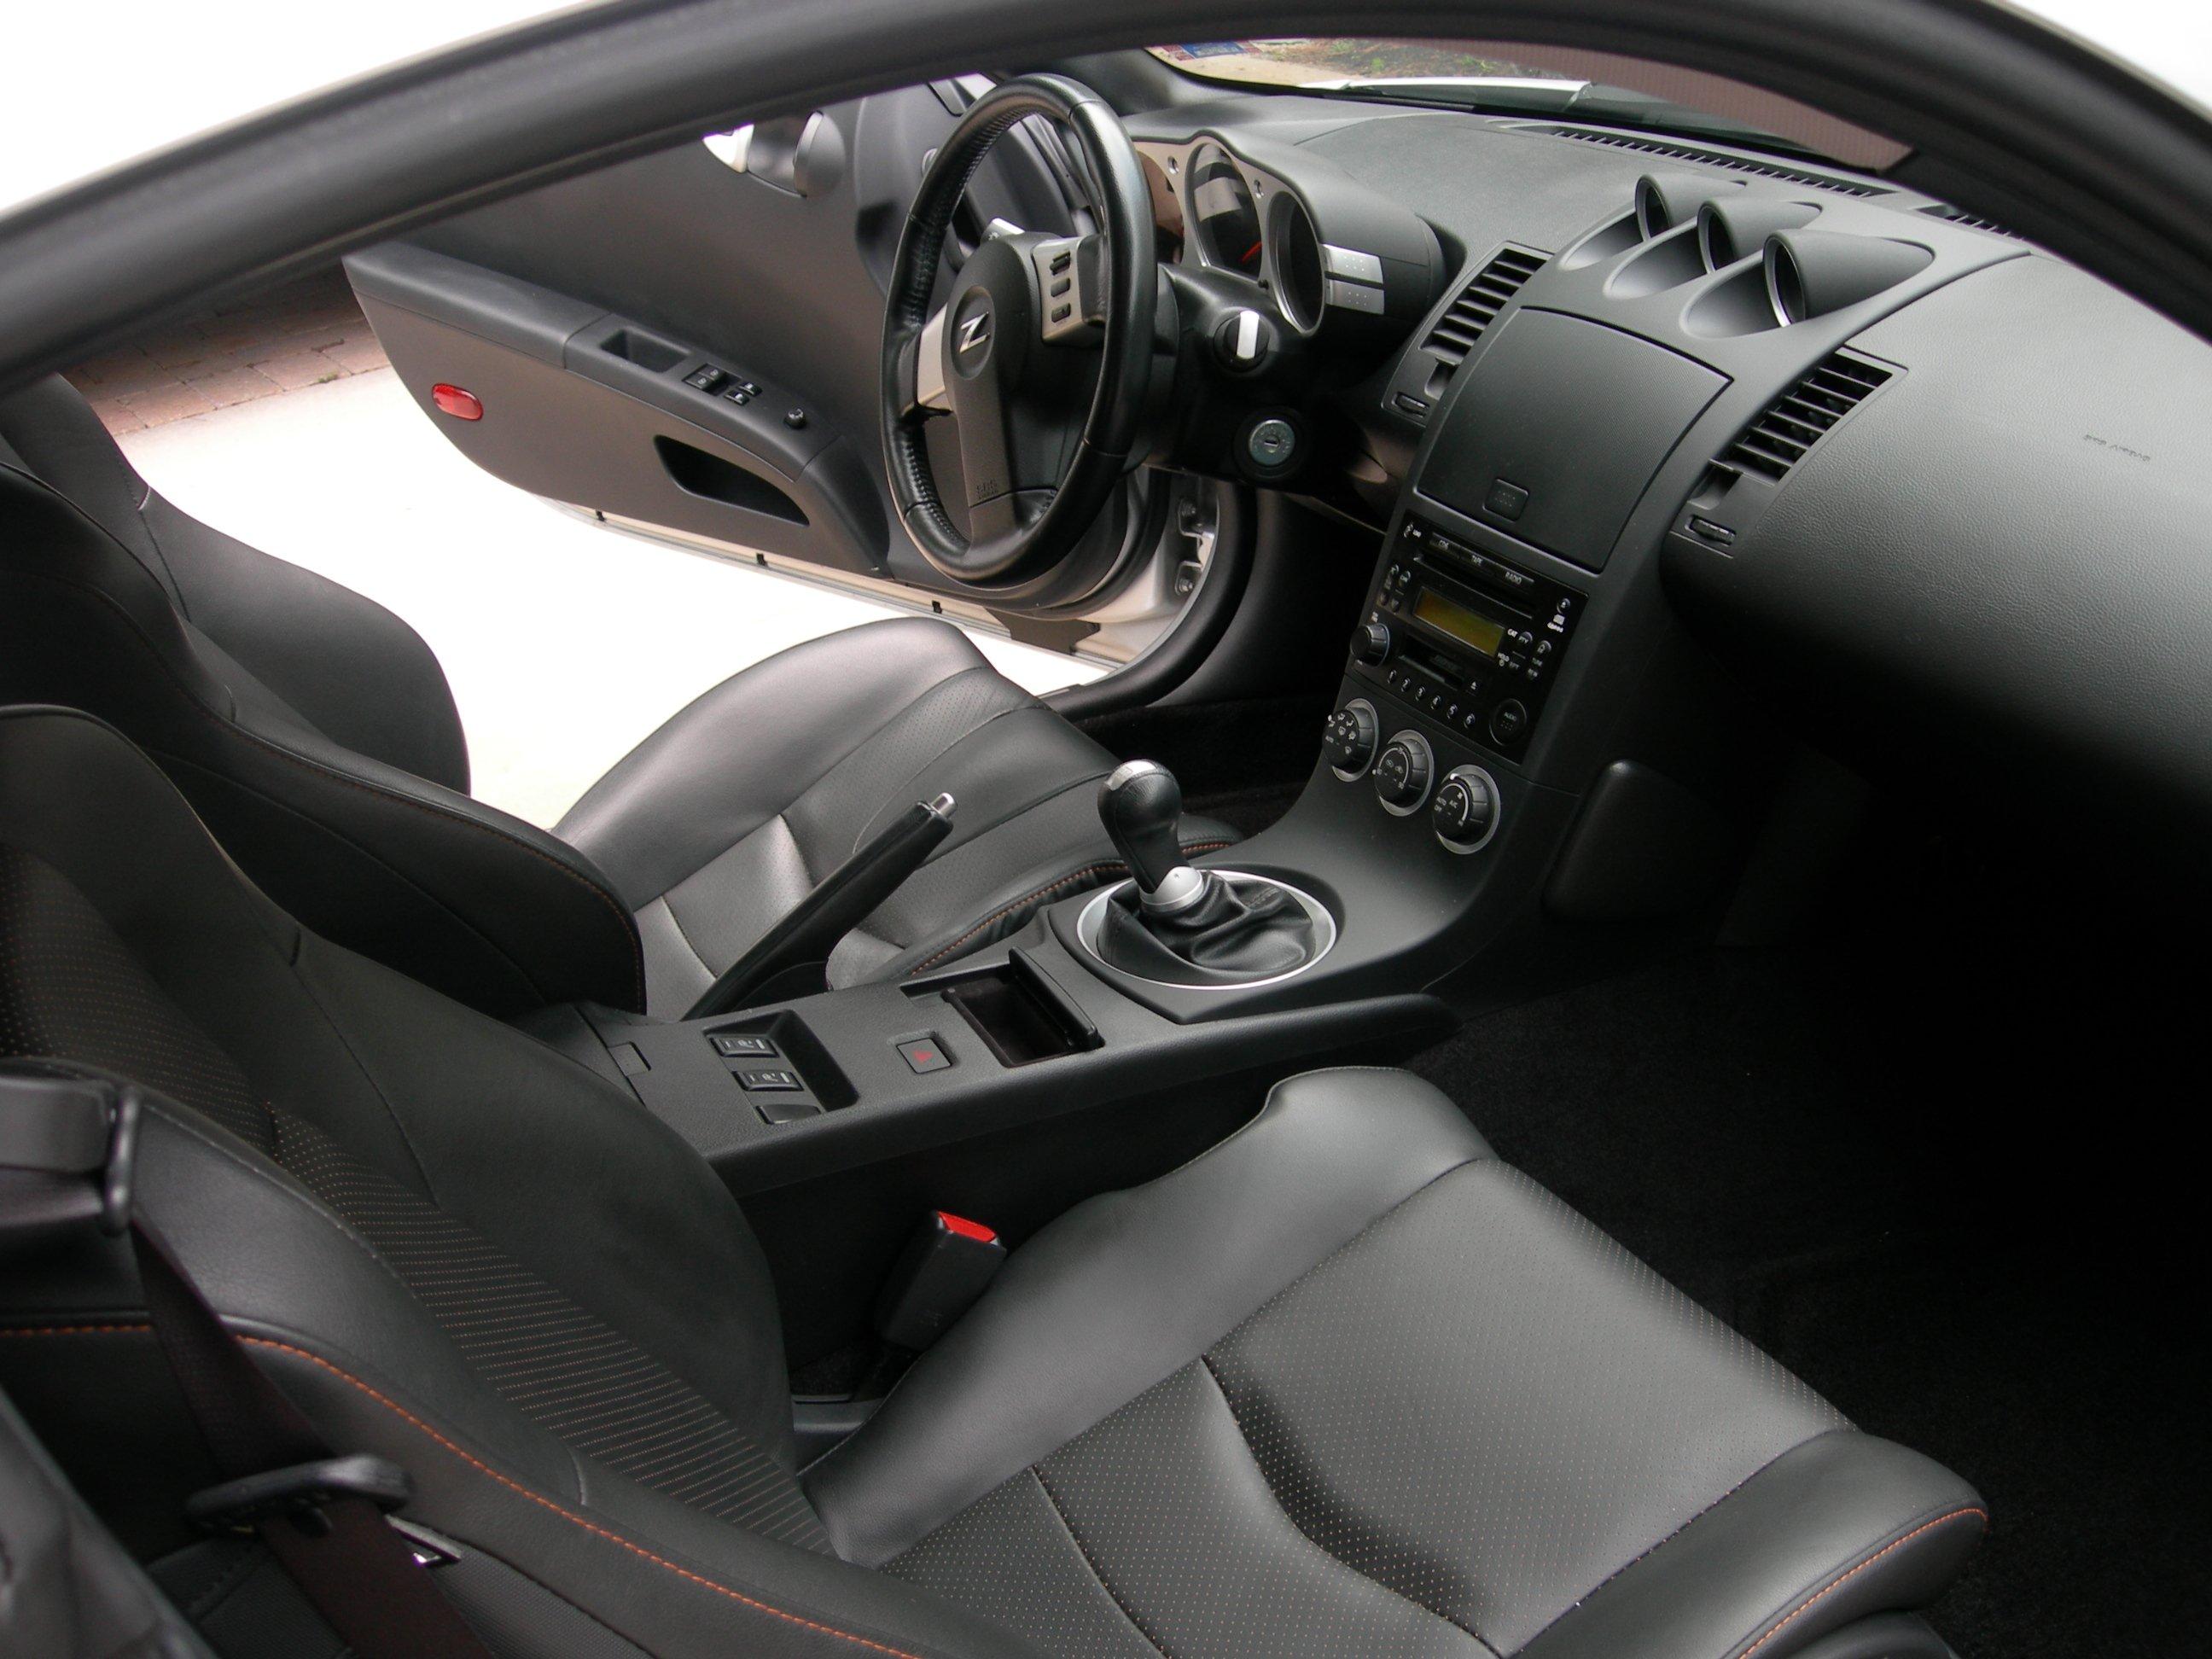 2004 nissan 350z touring model coupe 23989 nissan 350z 2004 nissan 350z touring model coupe 23989 nissan 350z forum nissan 370z tech forums vanachro Images